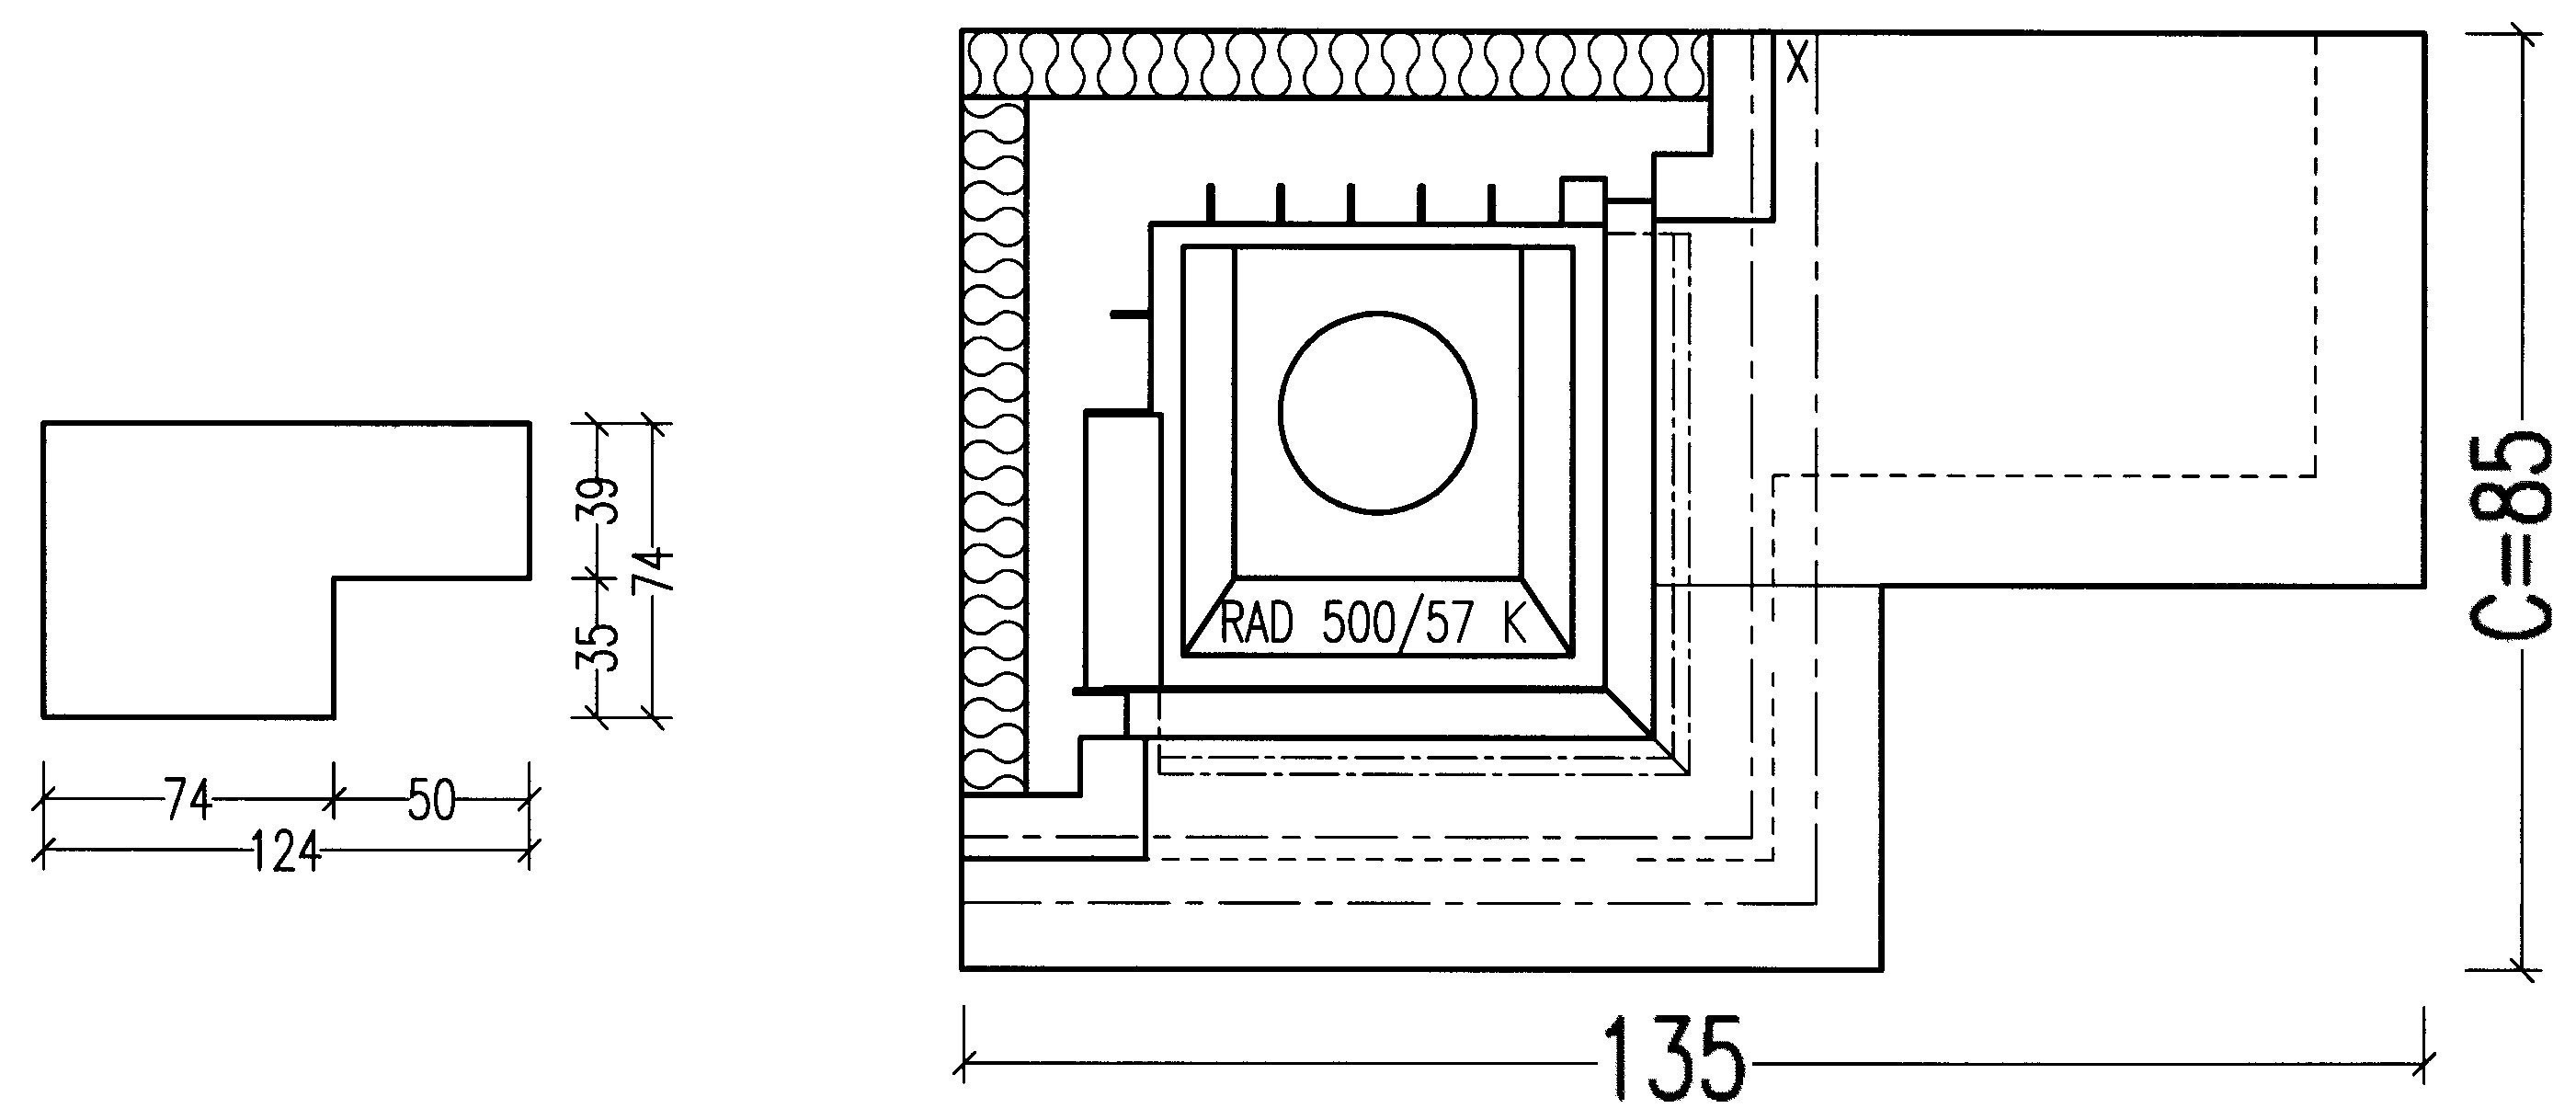 Kaminbausatz Hark Nebraska mit Radiante 500/57K Marmor Bank links 5kW Bild 2